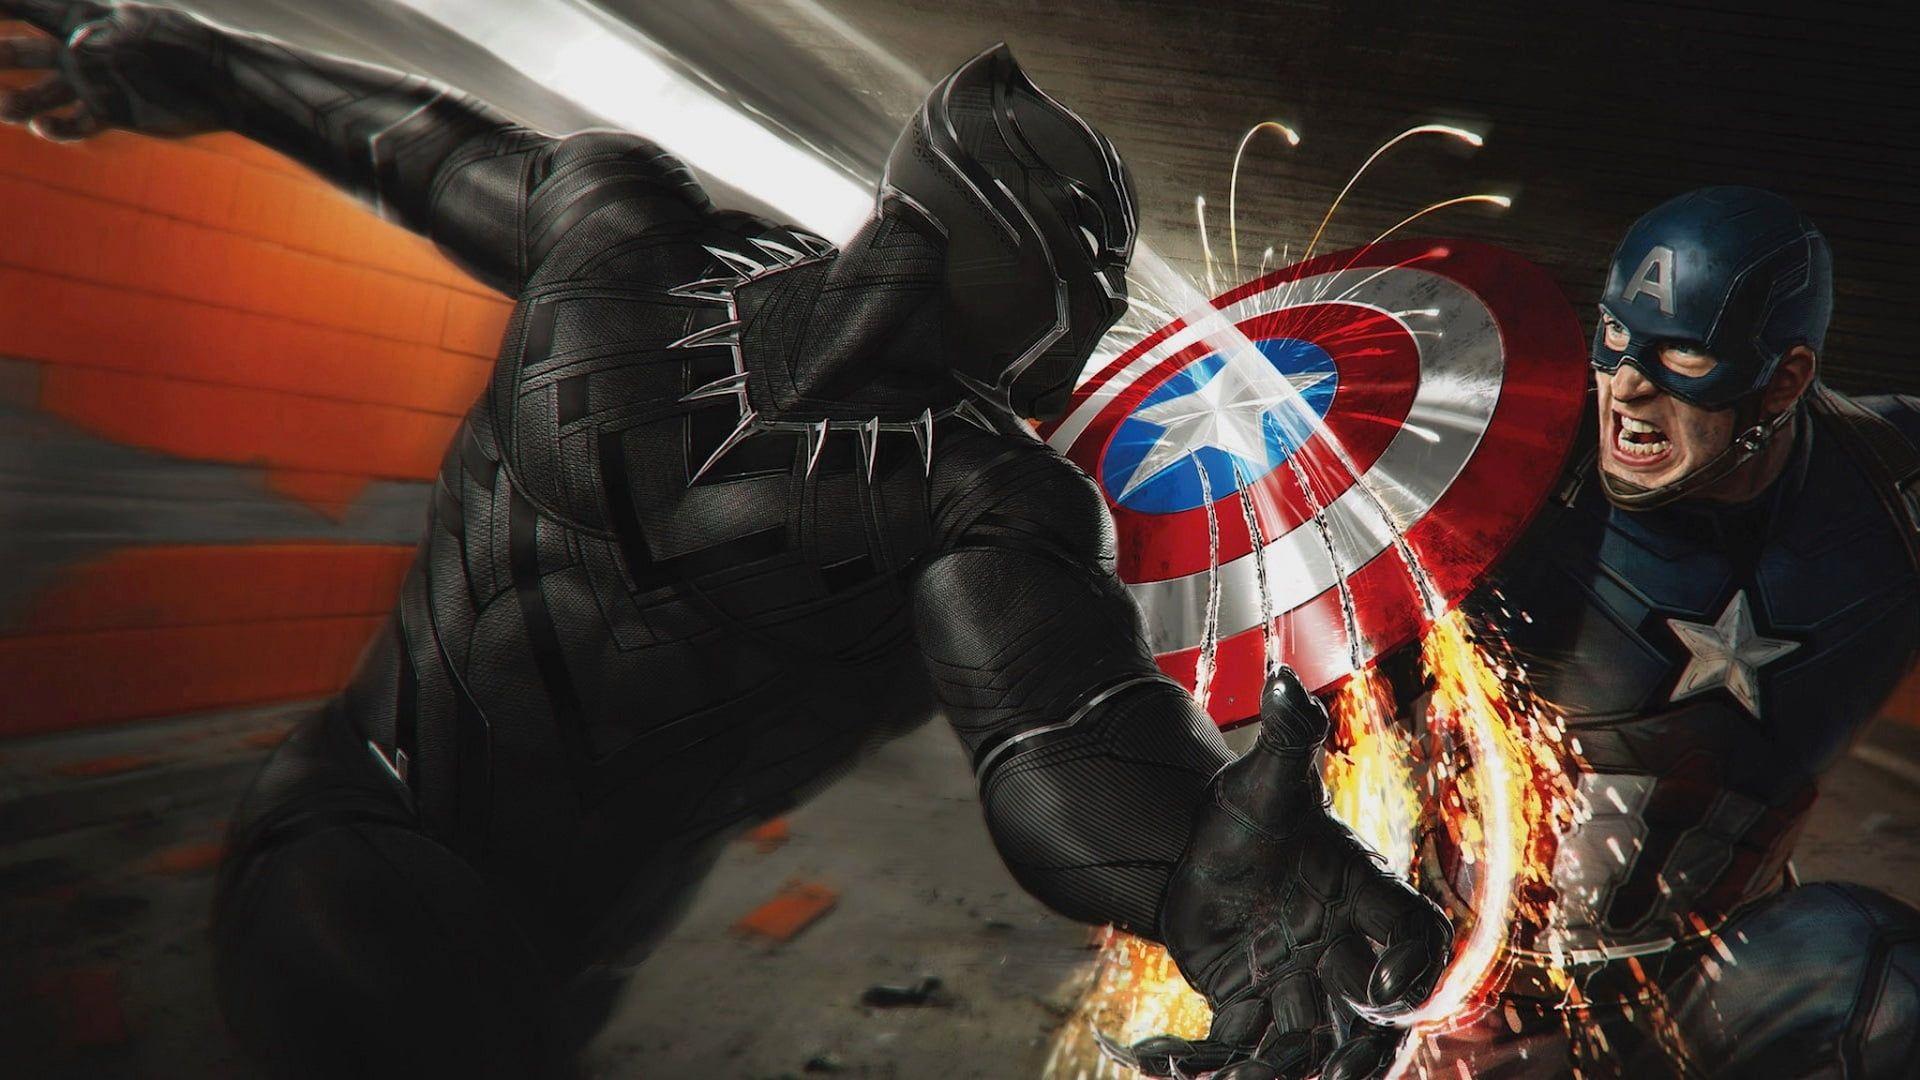 Captain America Illustration Marvel Black Panther Vs Captain America P Captain America Illustration Black Panther Marvel Wallpapers Black Panther Hd Wallpaper